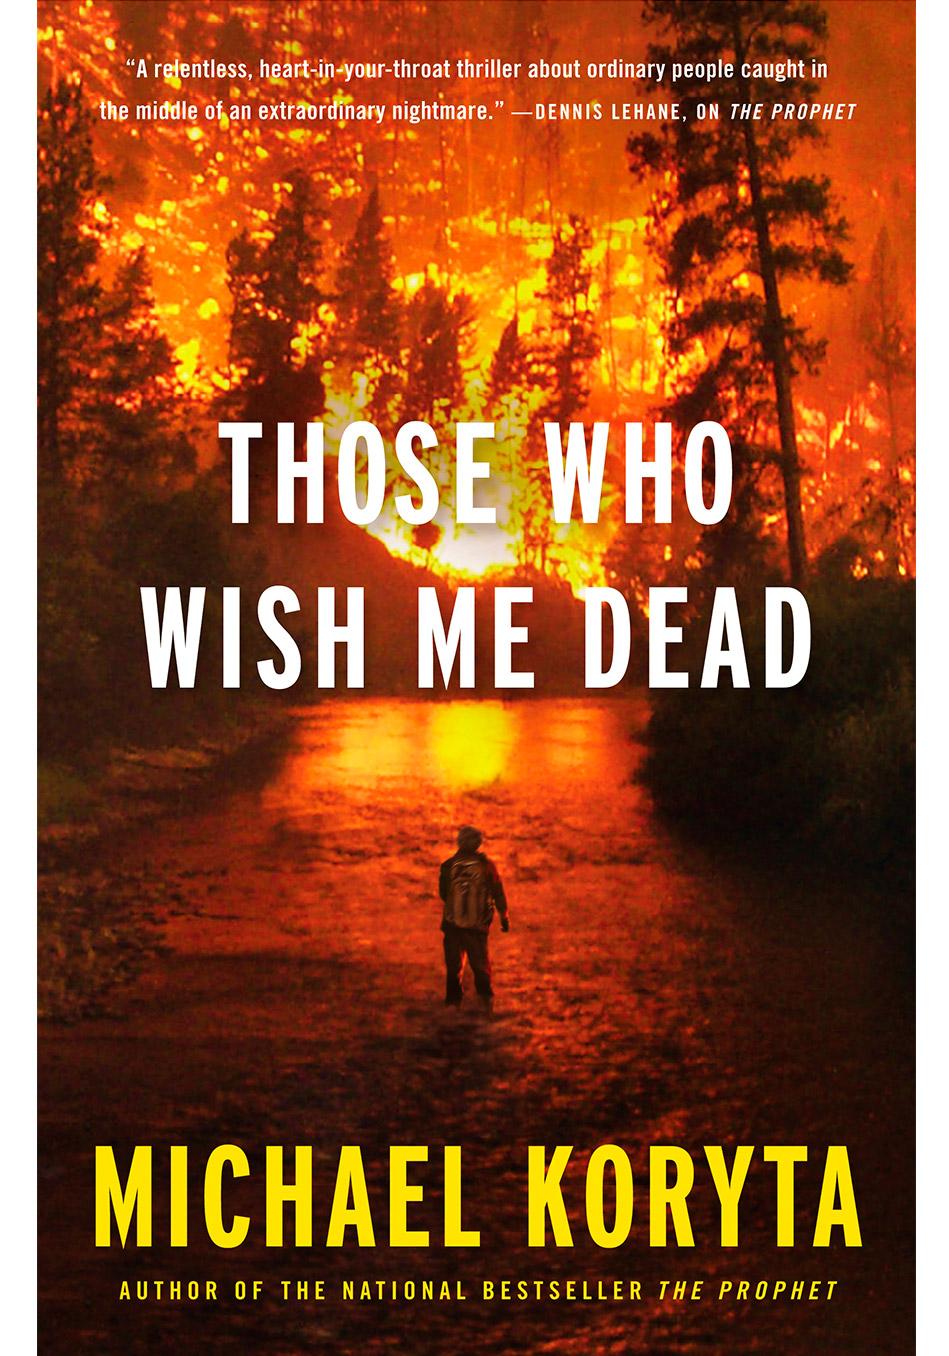 those who wish me dead - photo #1